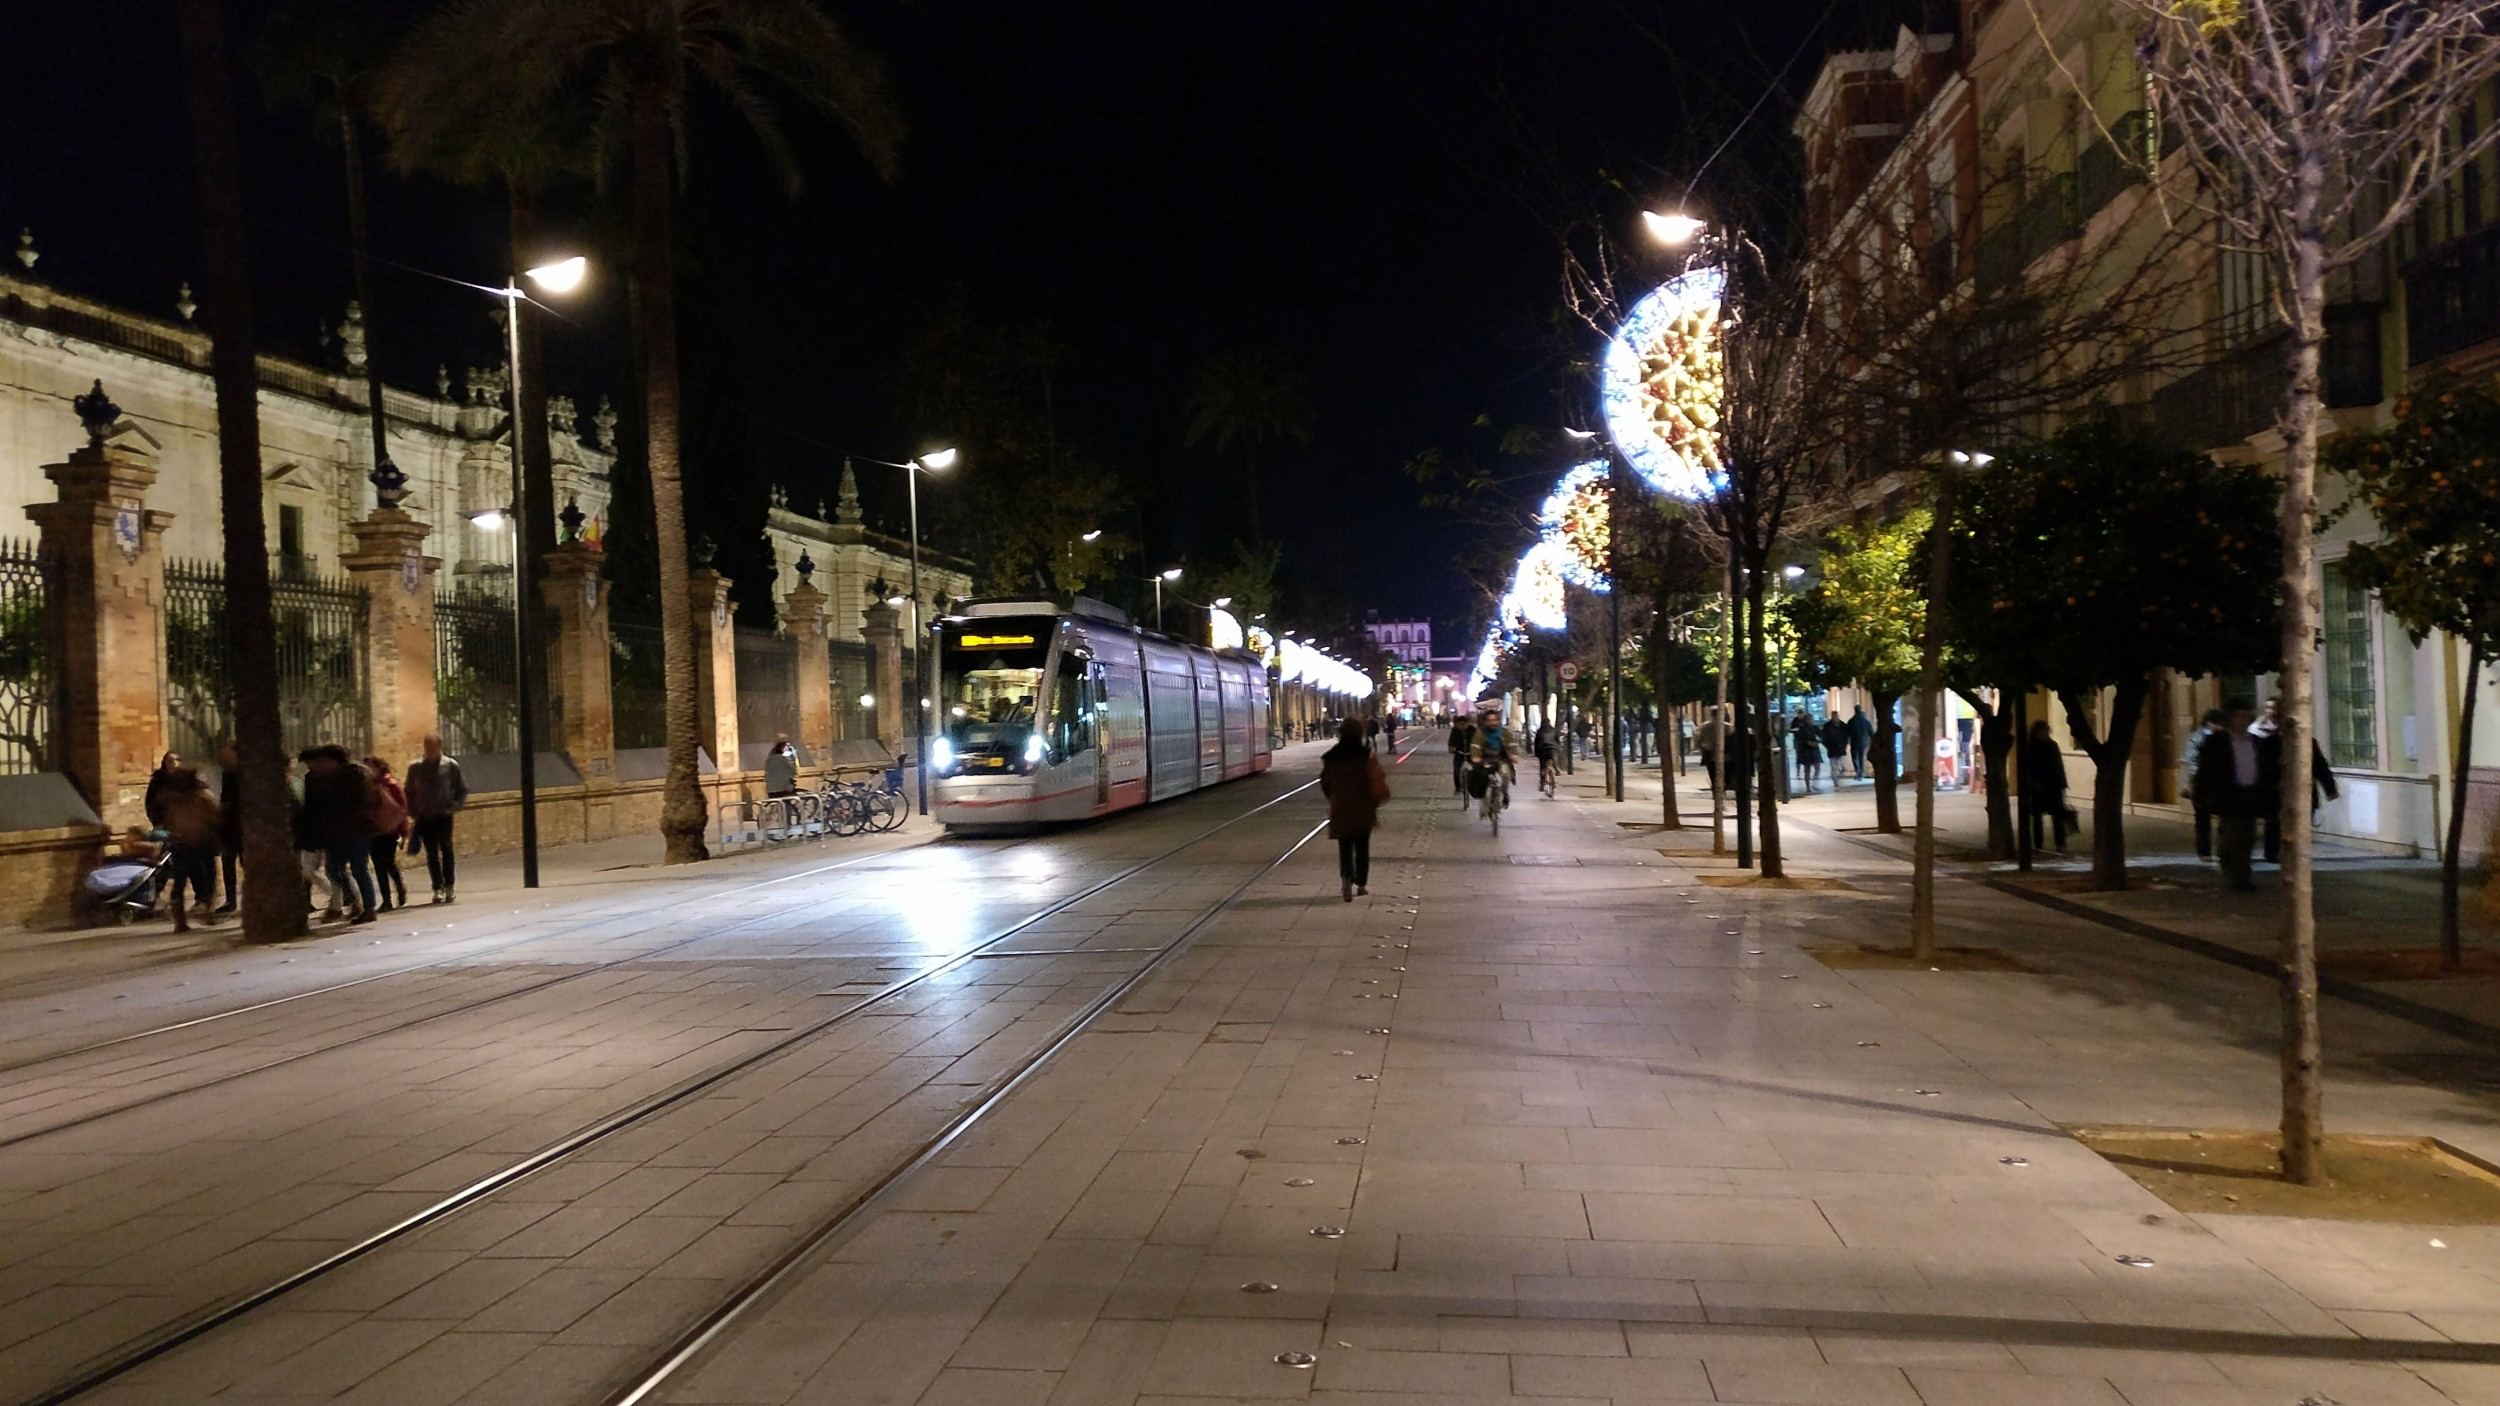 Plaza De Espana Amp Old Town Seville Visions Of Travel